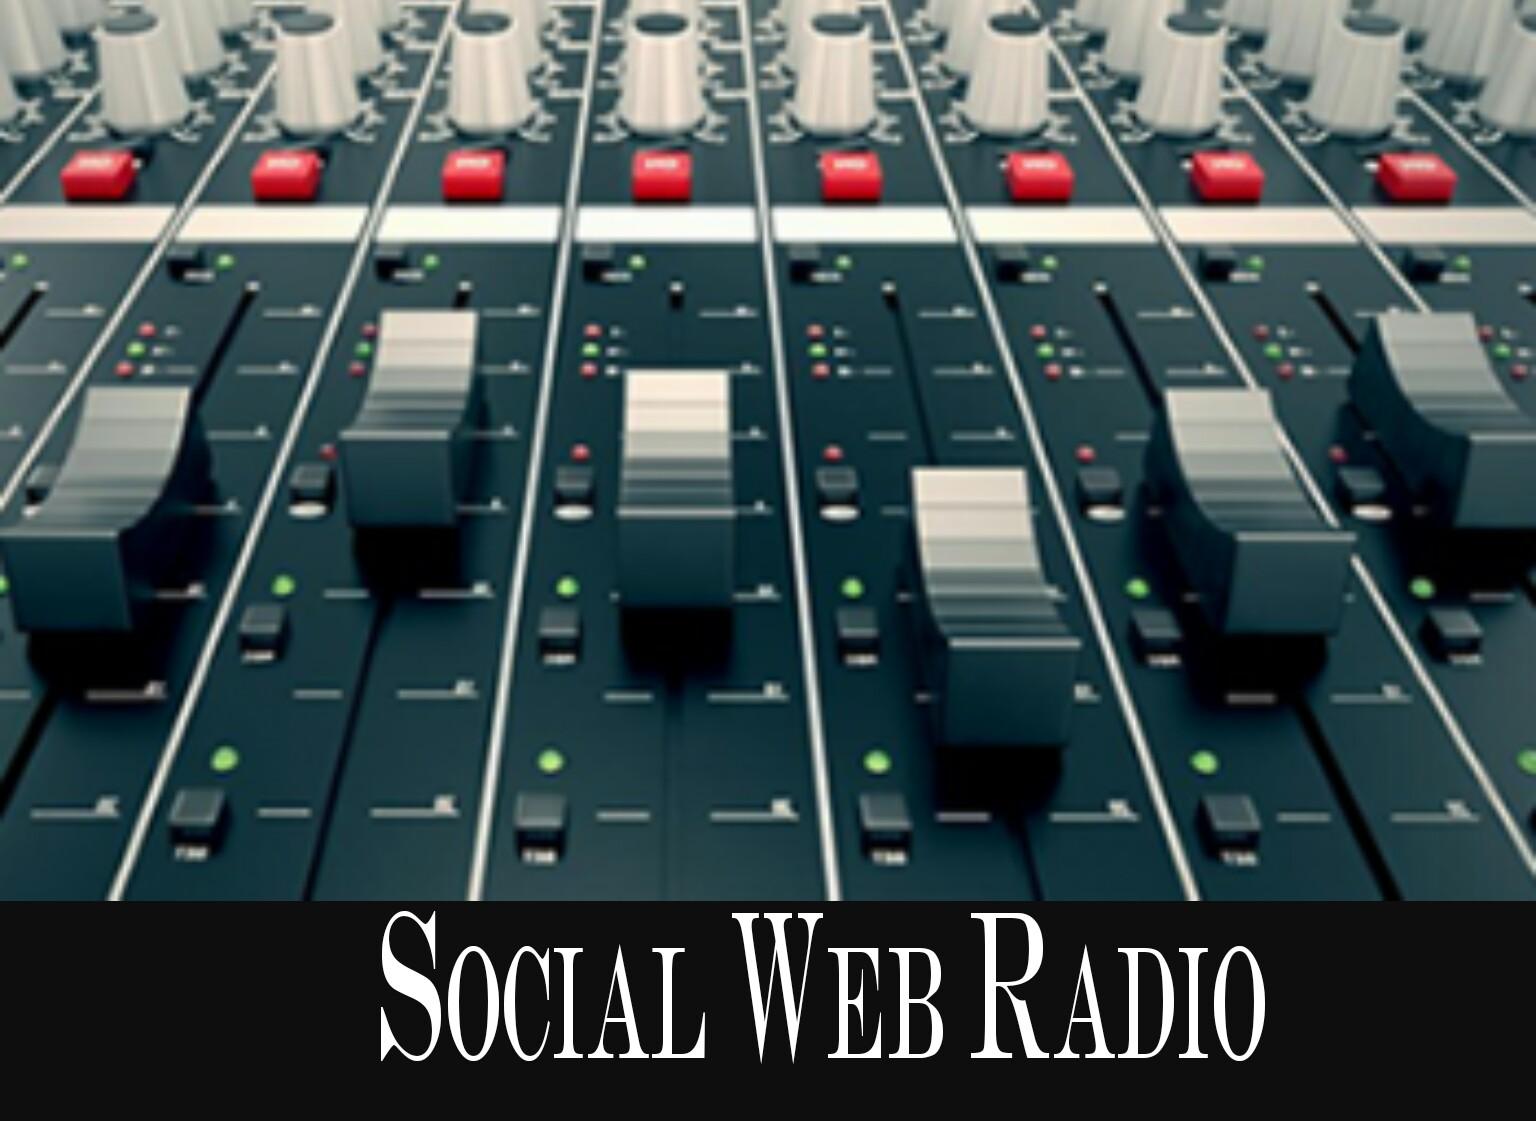 Social Web Radio